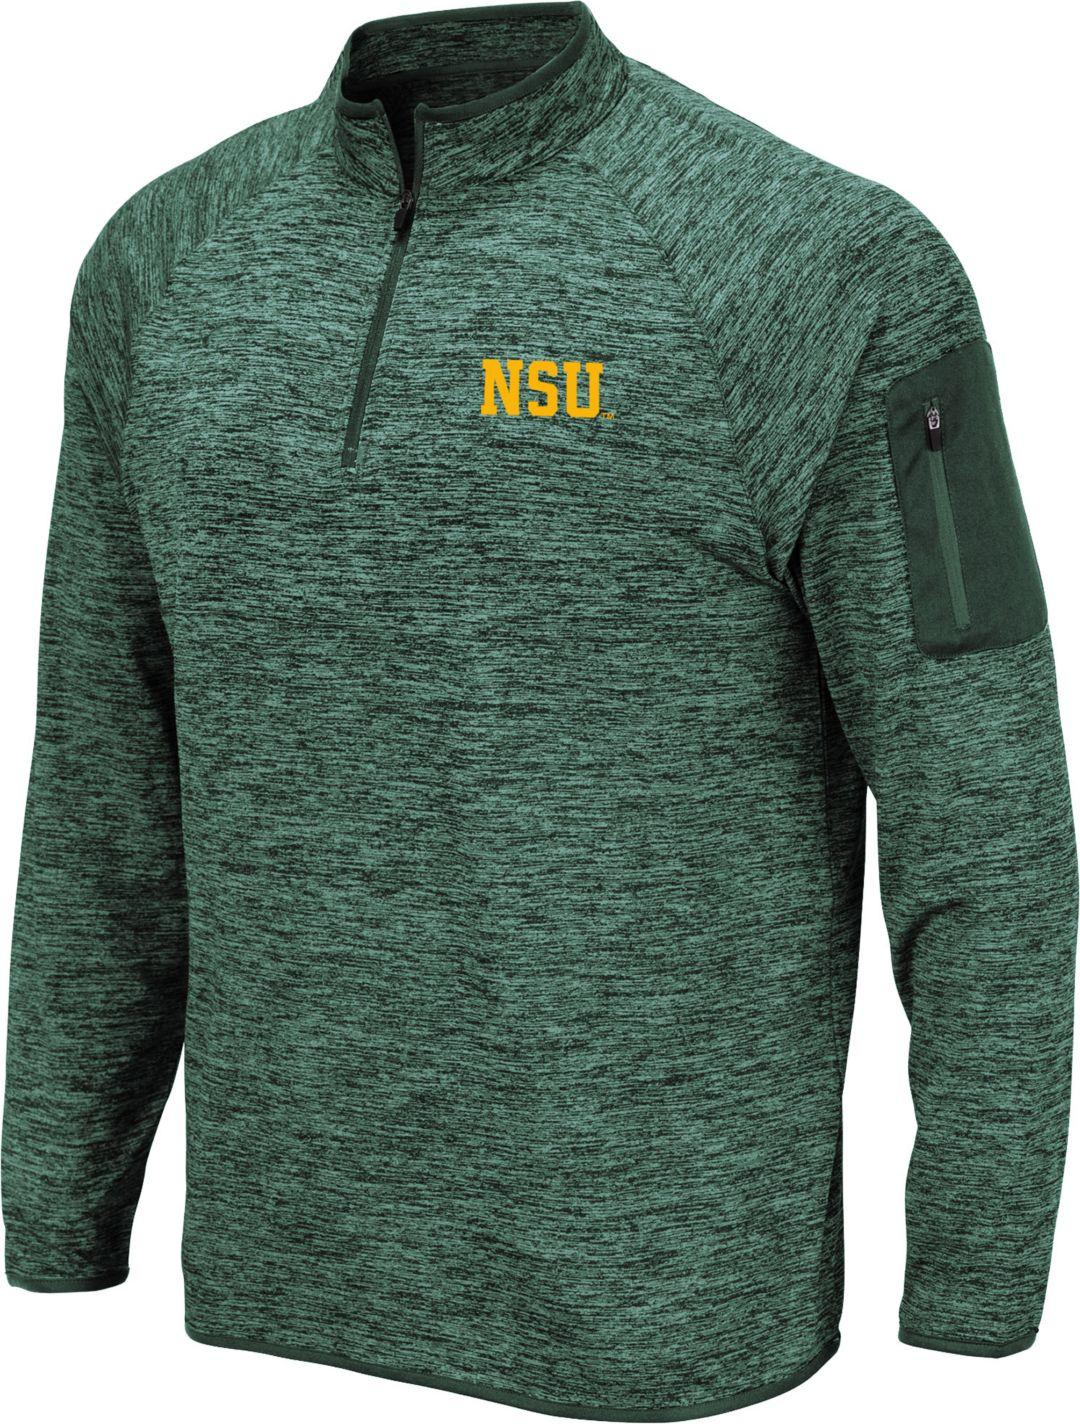 wholesale dealer 371c0 02fa0 Colosseum Men's Norfolk State Spartans Green Quarter-Zip Shirt